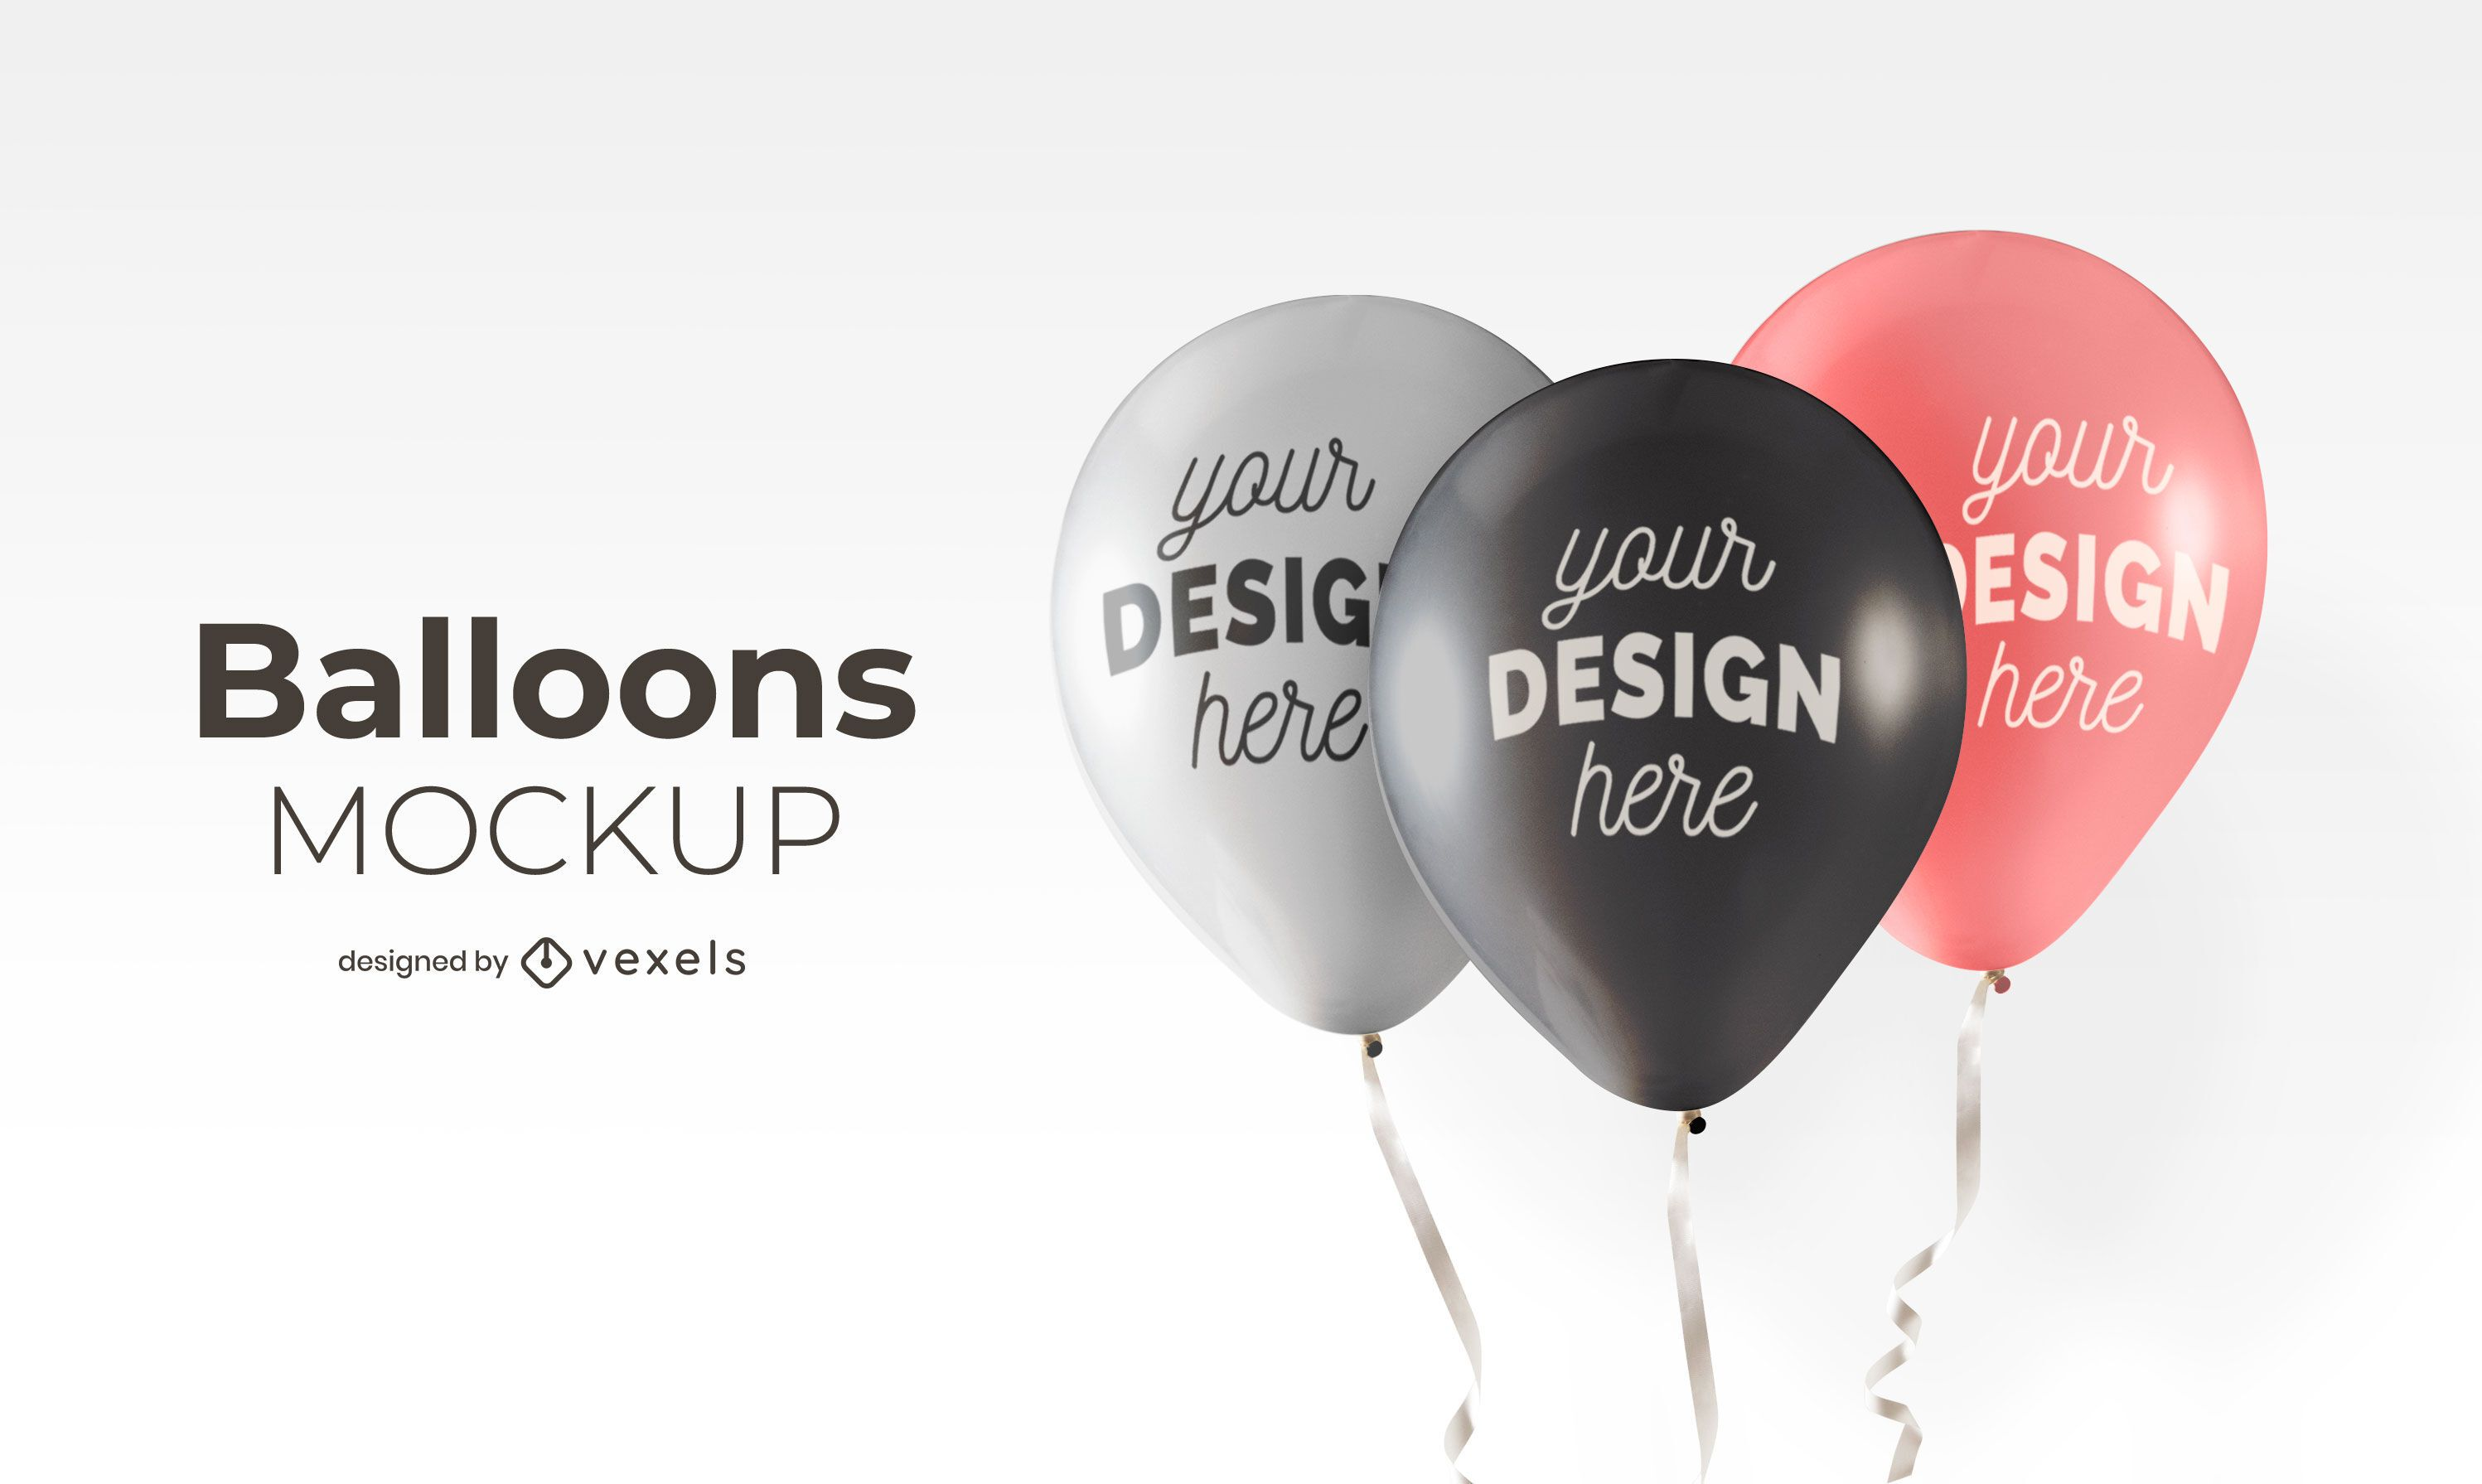 Diseño de maqueta de globos